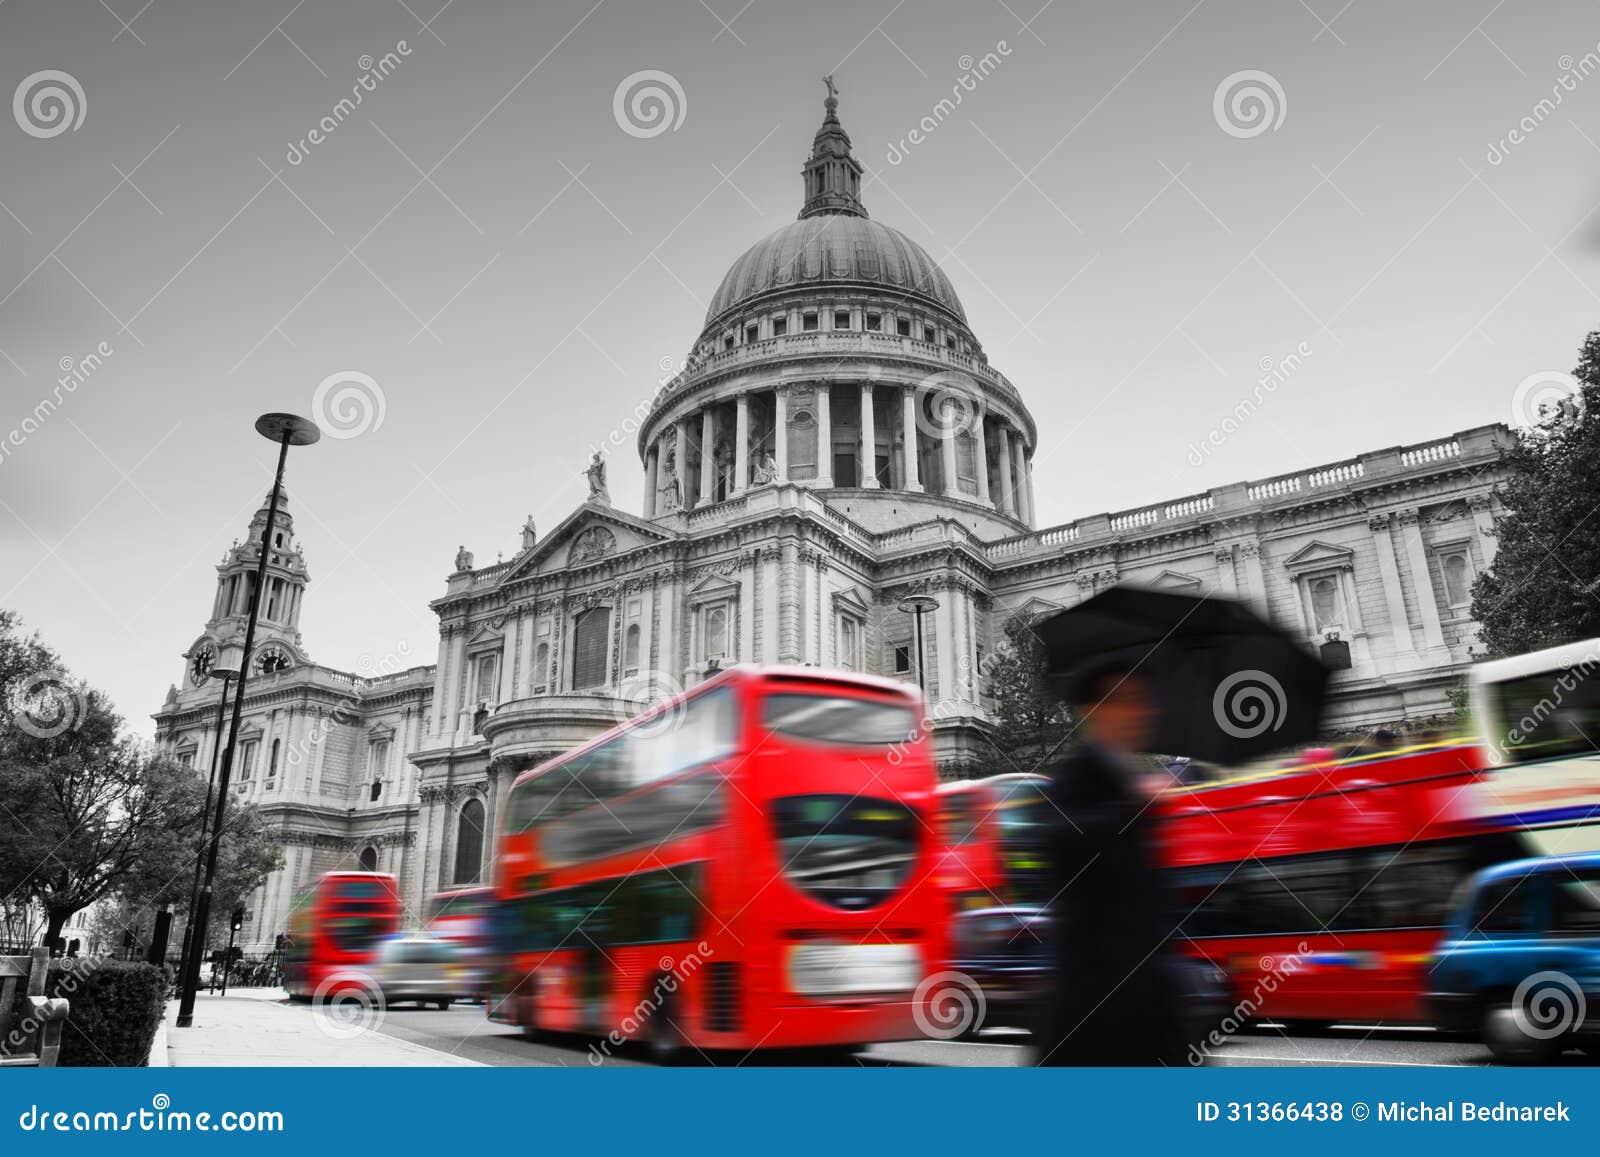 Sts Paul domkyrka i London, UK. Röda bussar